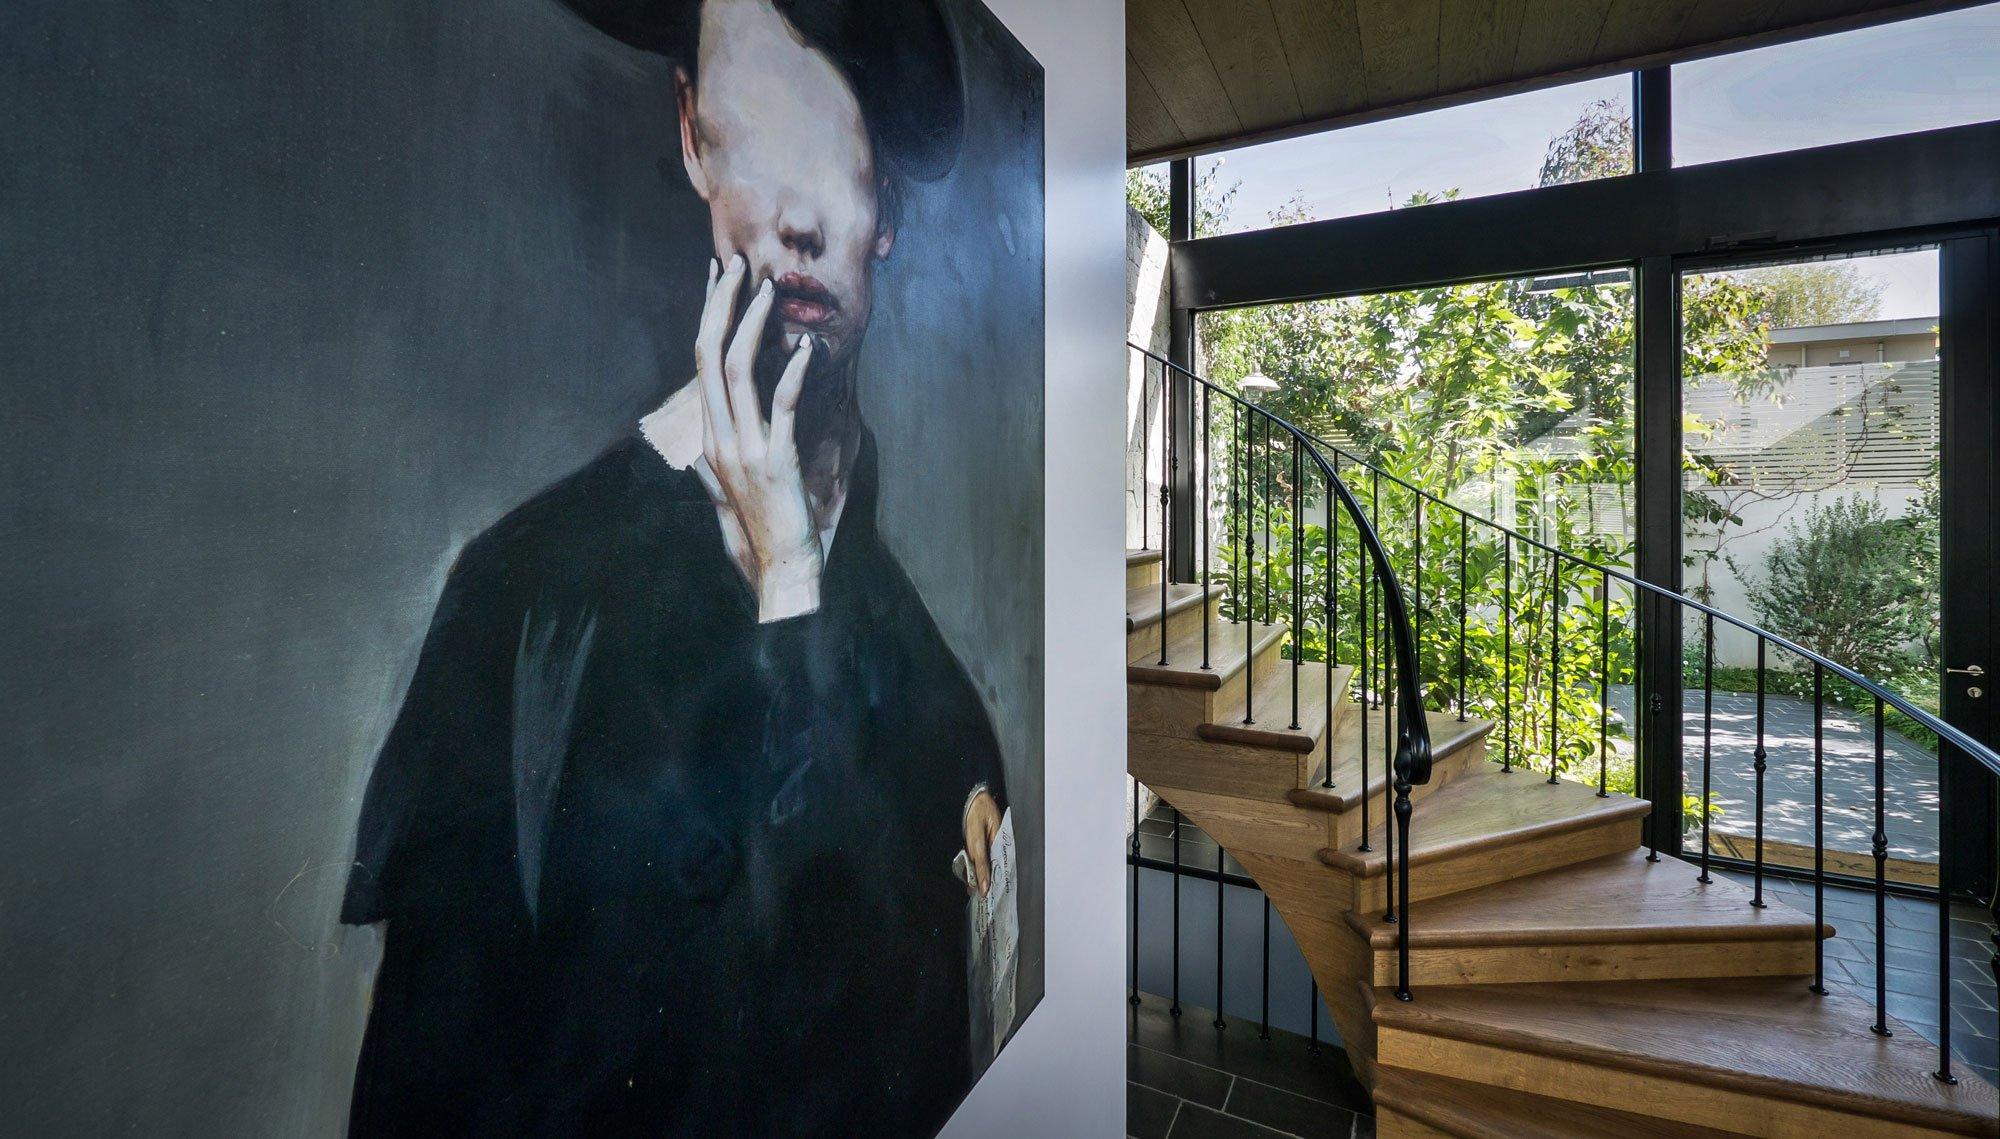 Home-in-Herzlia-Pituach-14